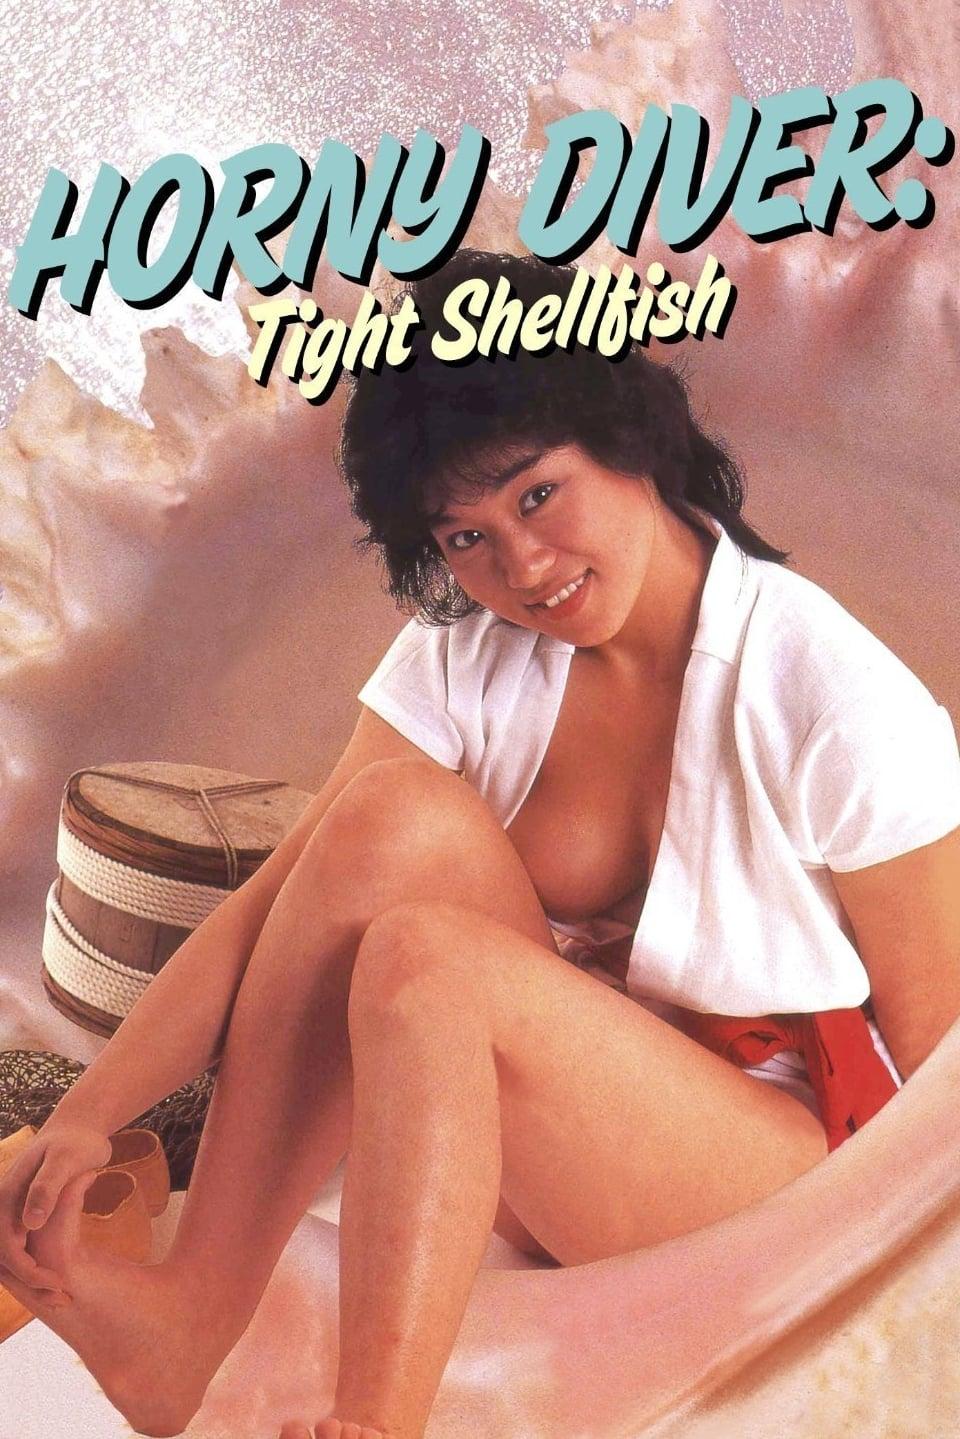 Horny Diver: Tight Shellfish